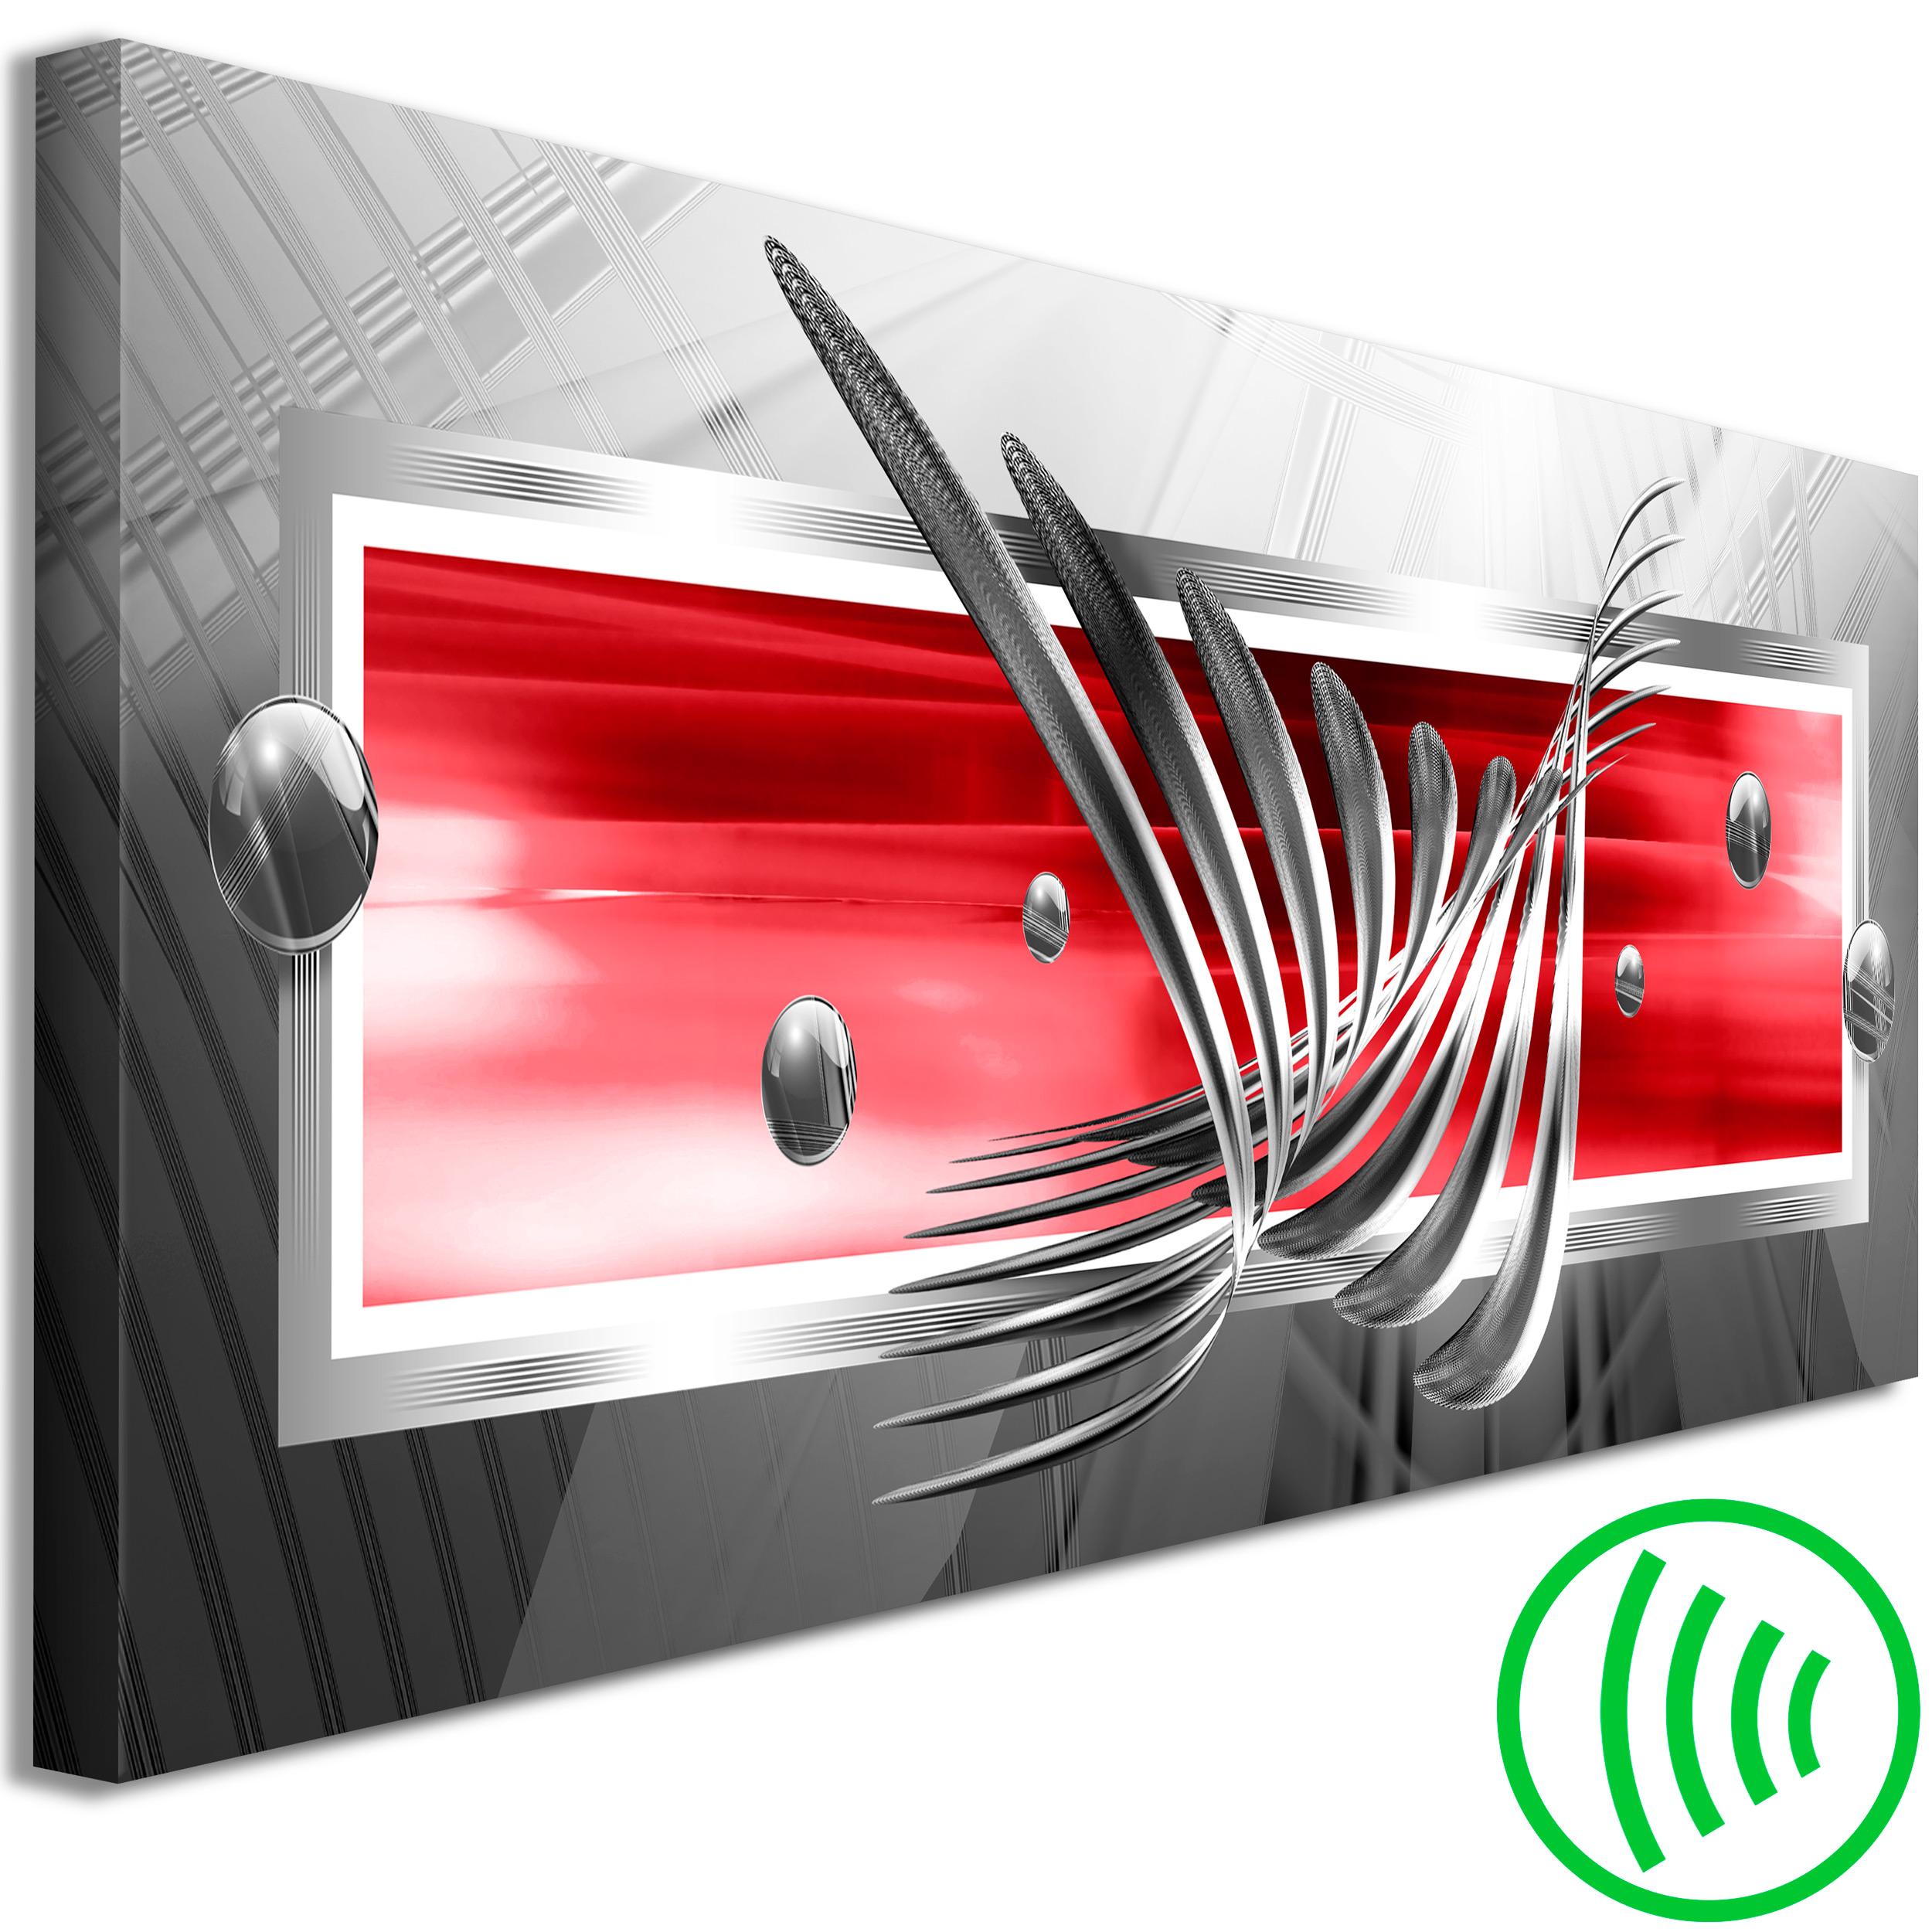 leinwand bilder abstrakt modern kugel 3d wandbilder xxl wohnzimmer 3 farb ebay. Black Bedroom Furniture Sets. Home Design Ideas